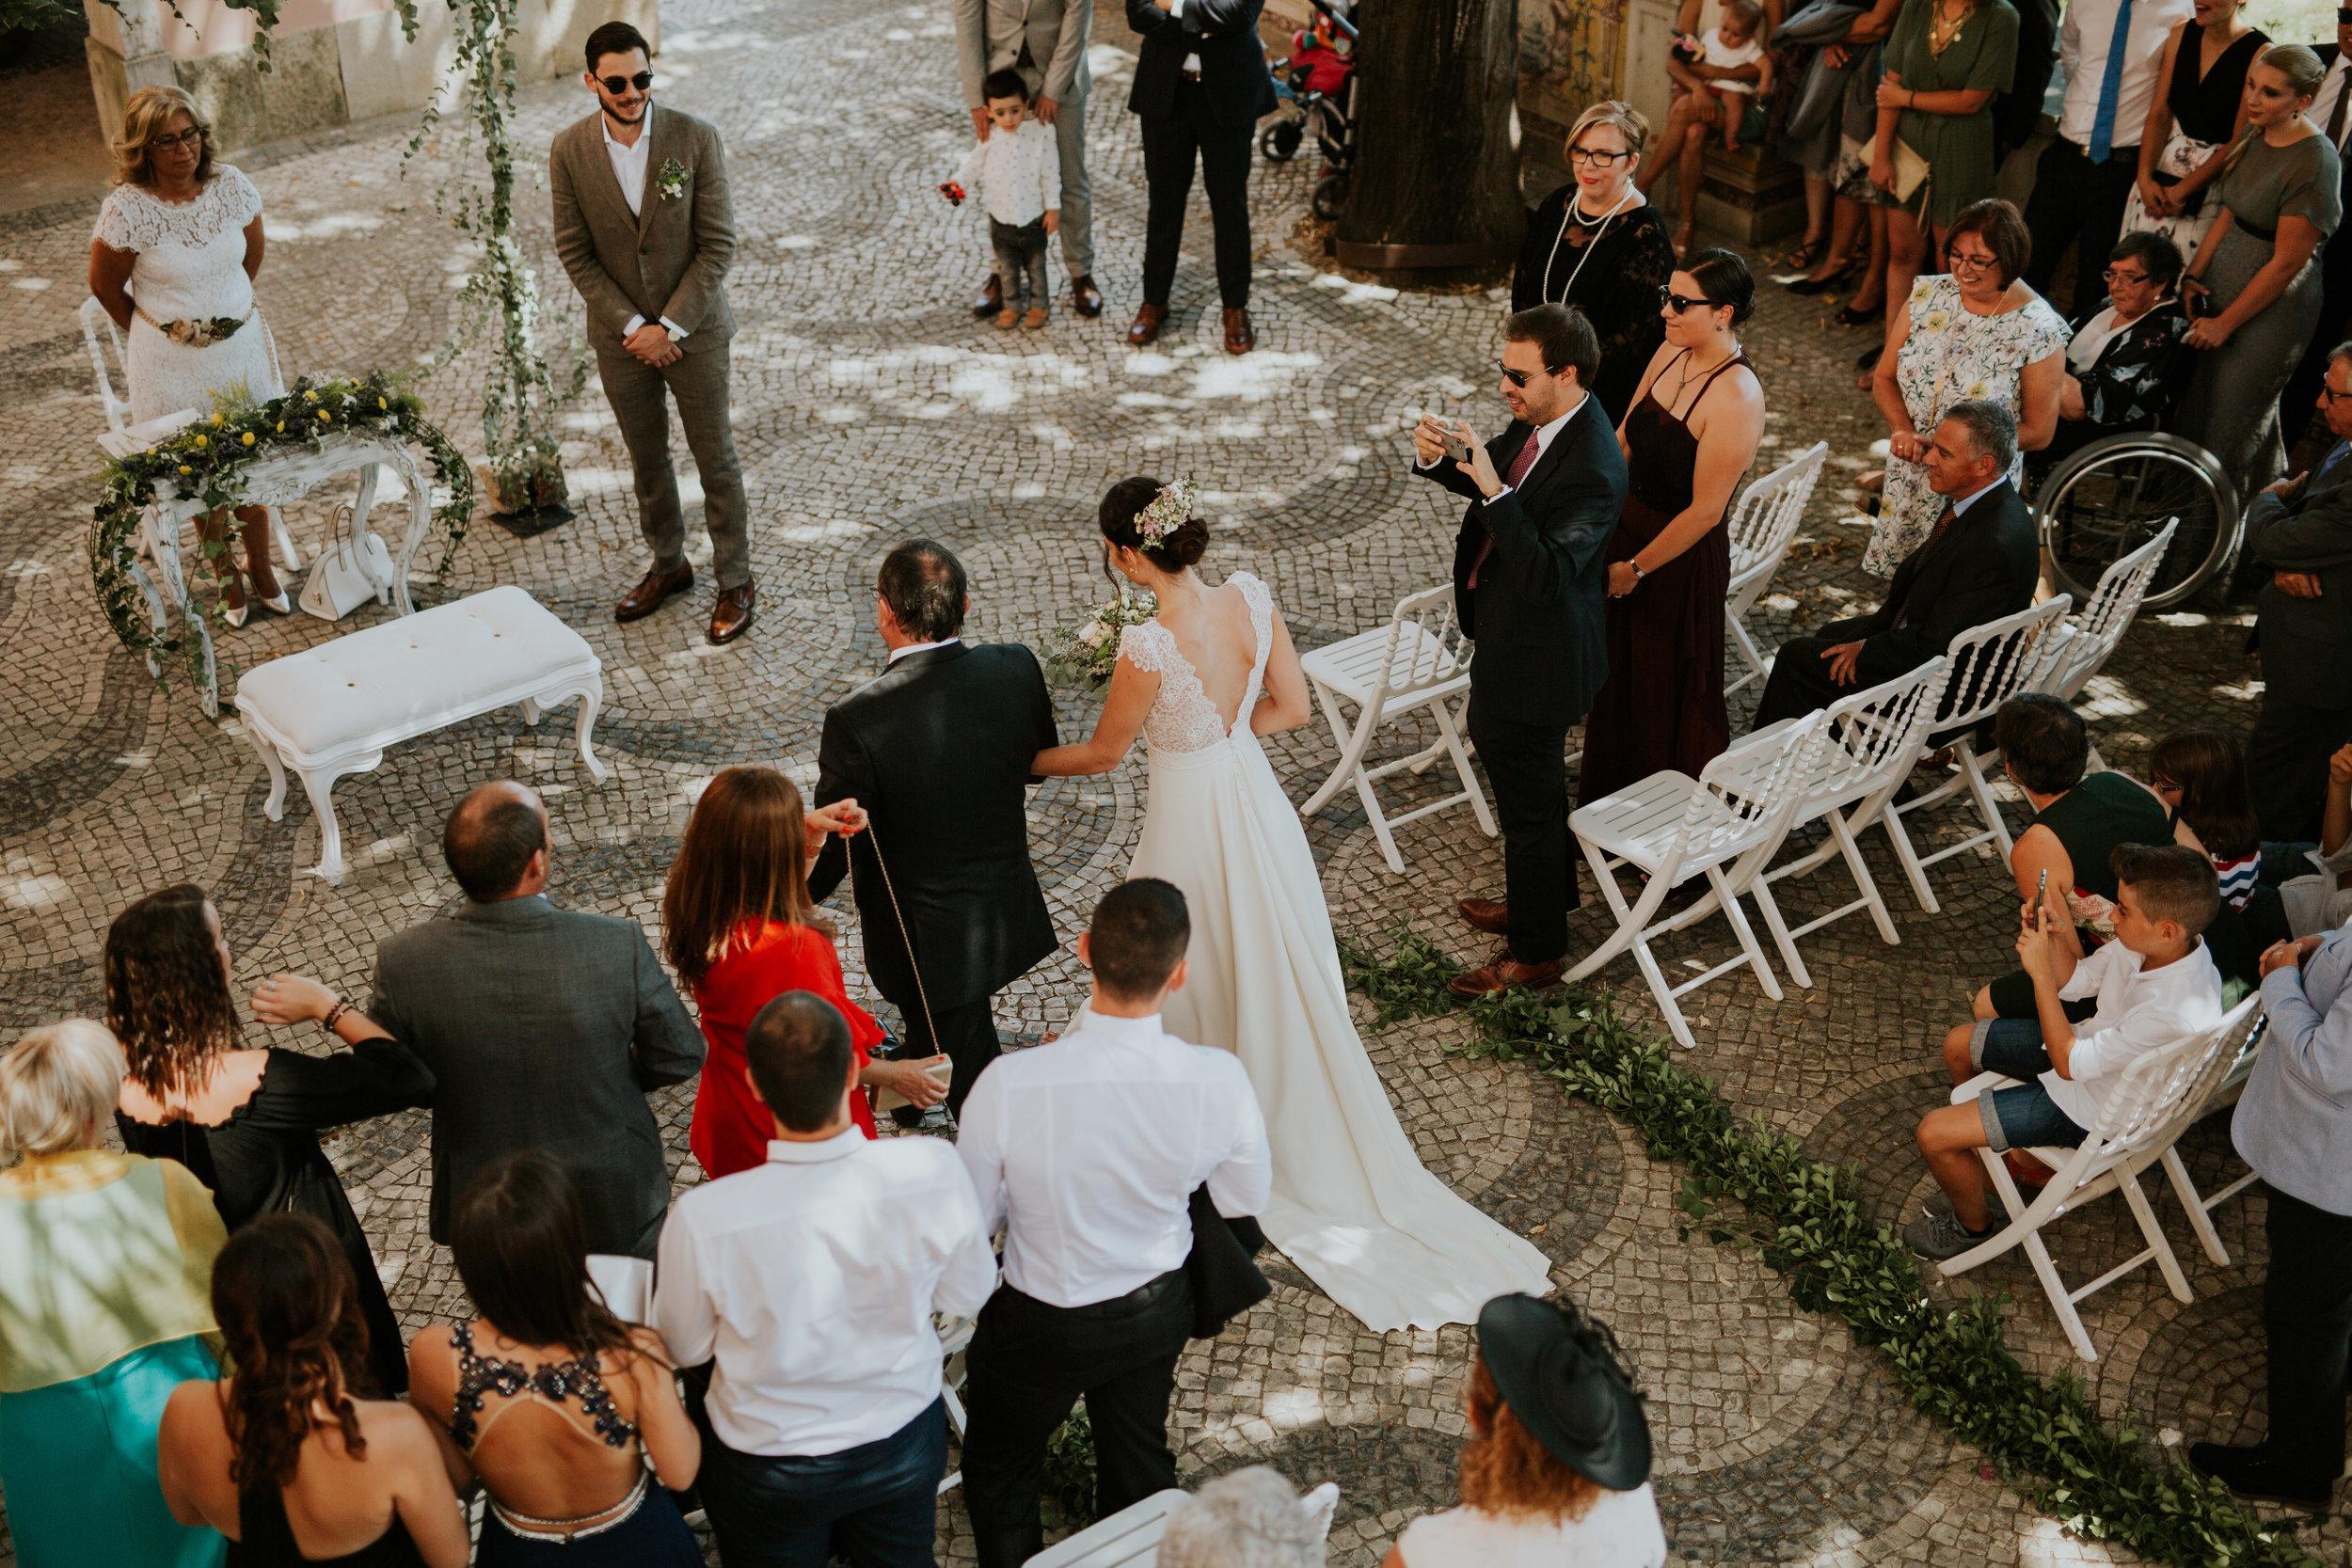 J&P 217_ 02 setembro 2017 Wedding day_.jpg